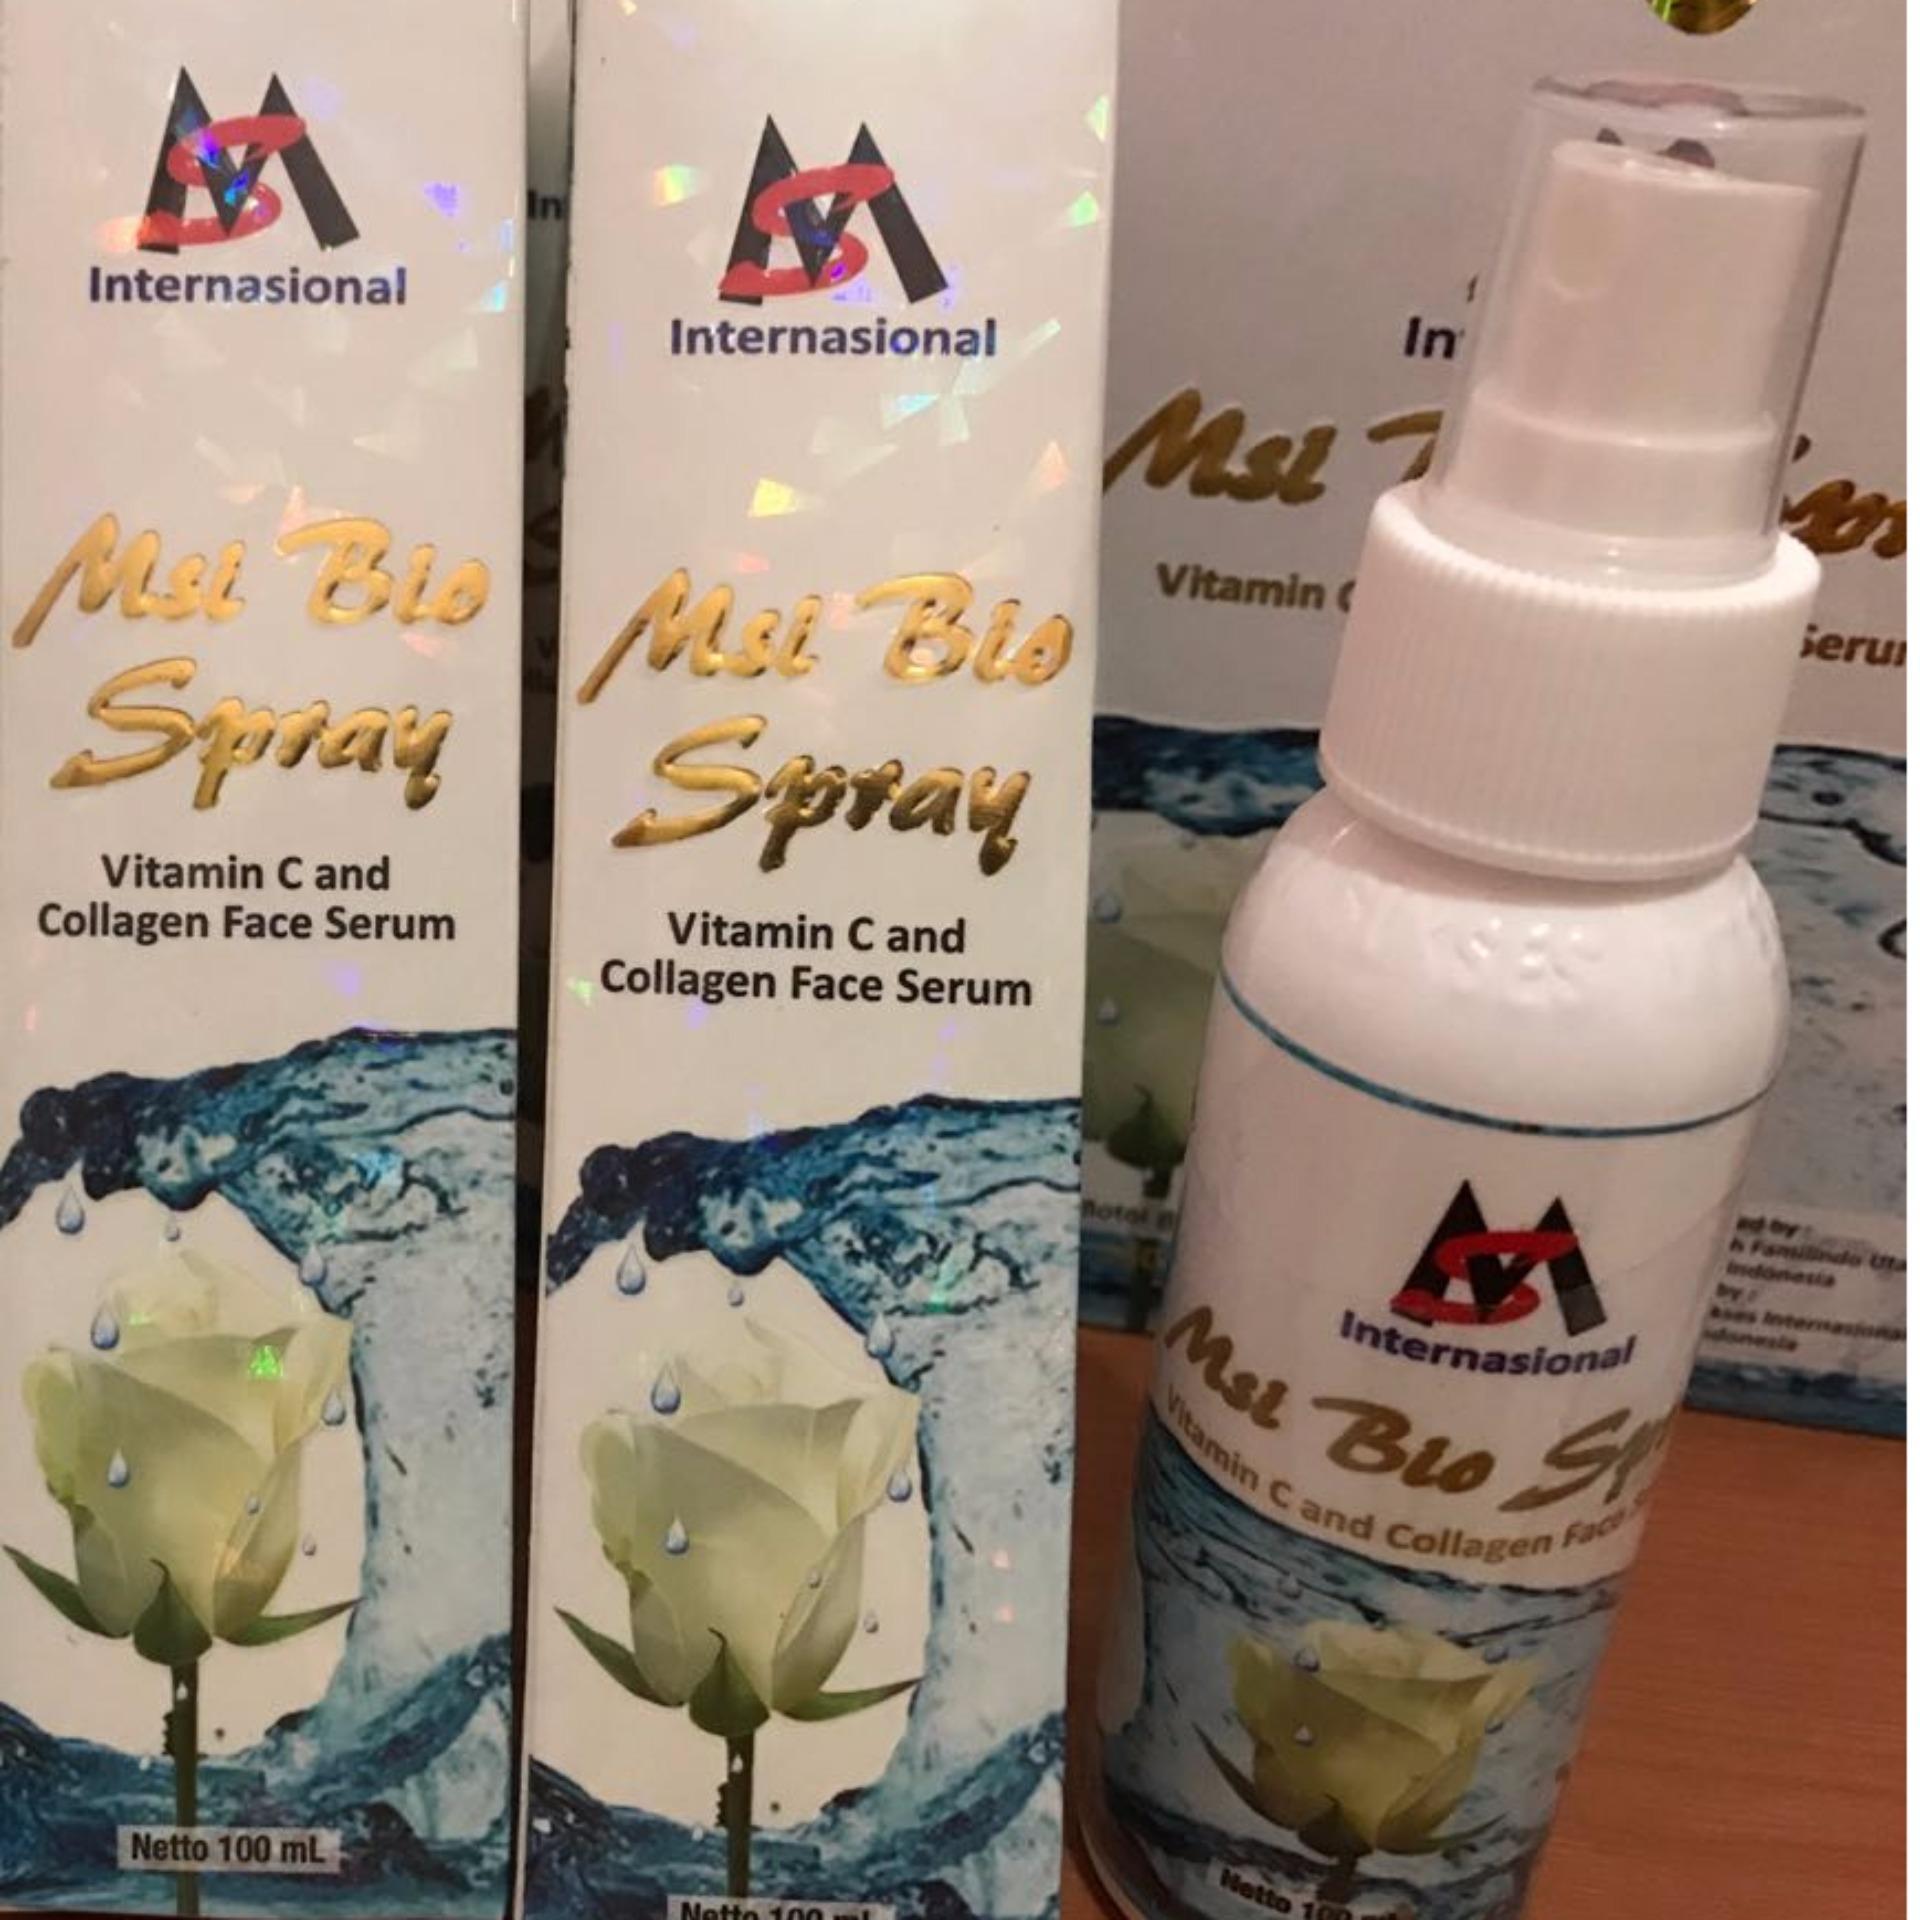 Msi Biospray Multy Original New 2pcs Update Daftar Harga Gold Beauty Face Mist Dijamin Penggantinya Silver Ion Bio Spray Multispray Multi Multyspray